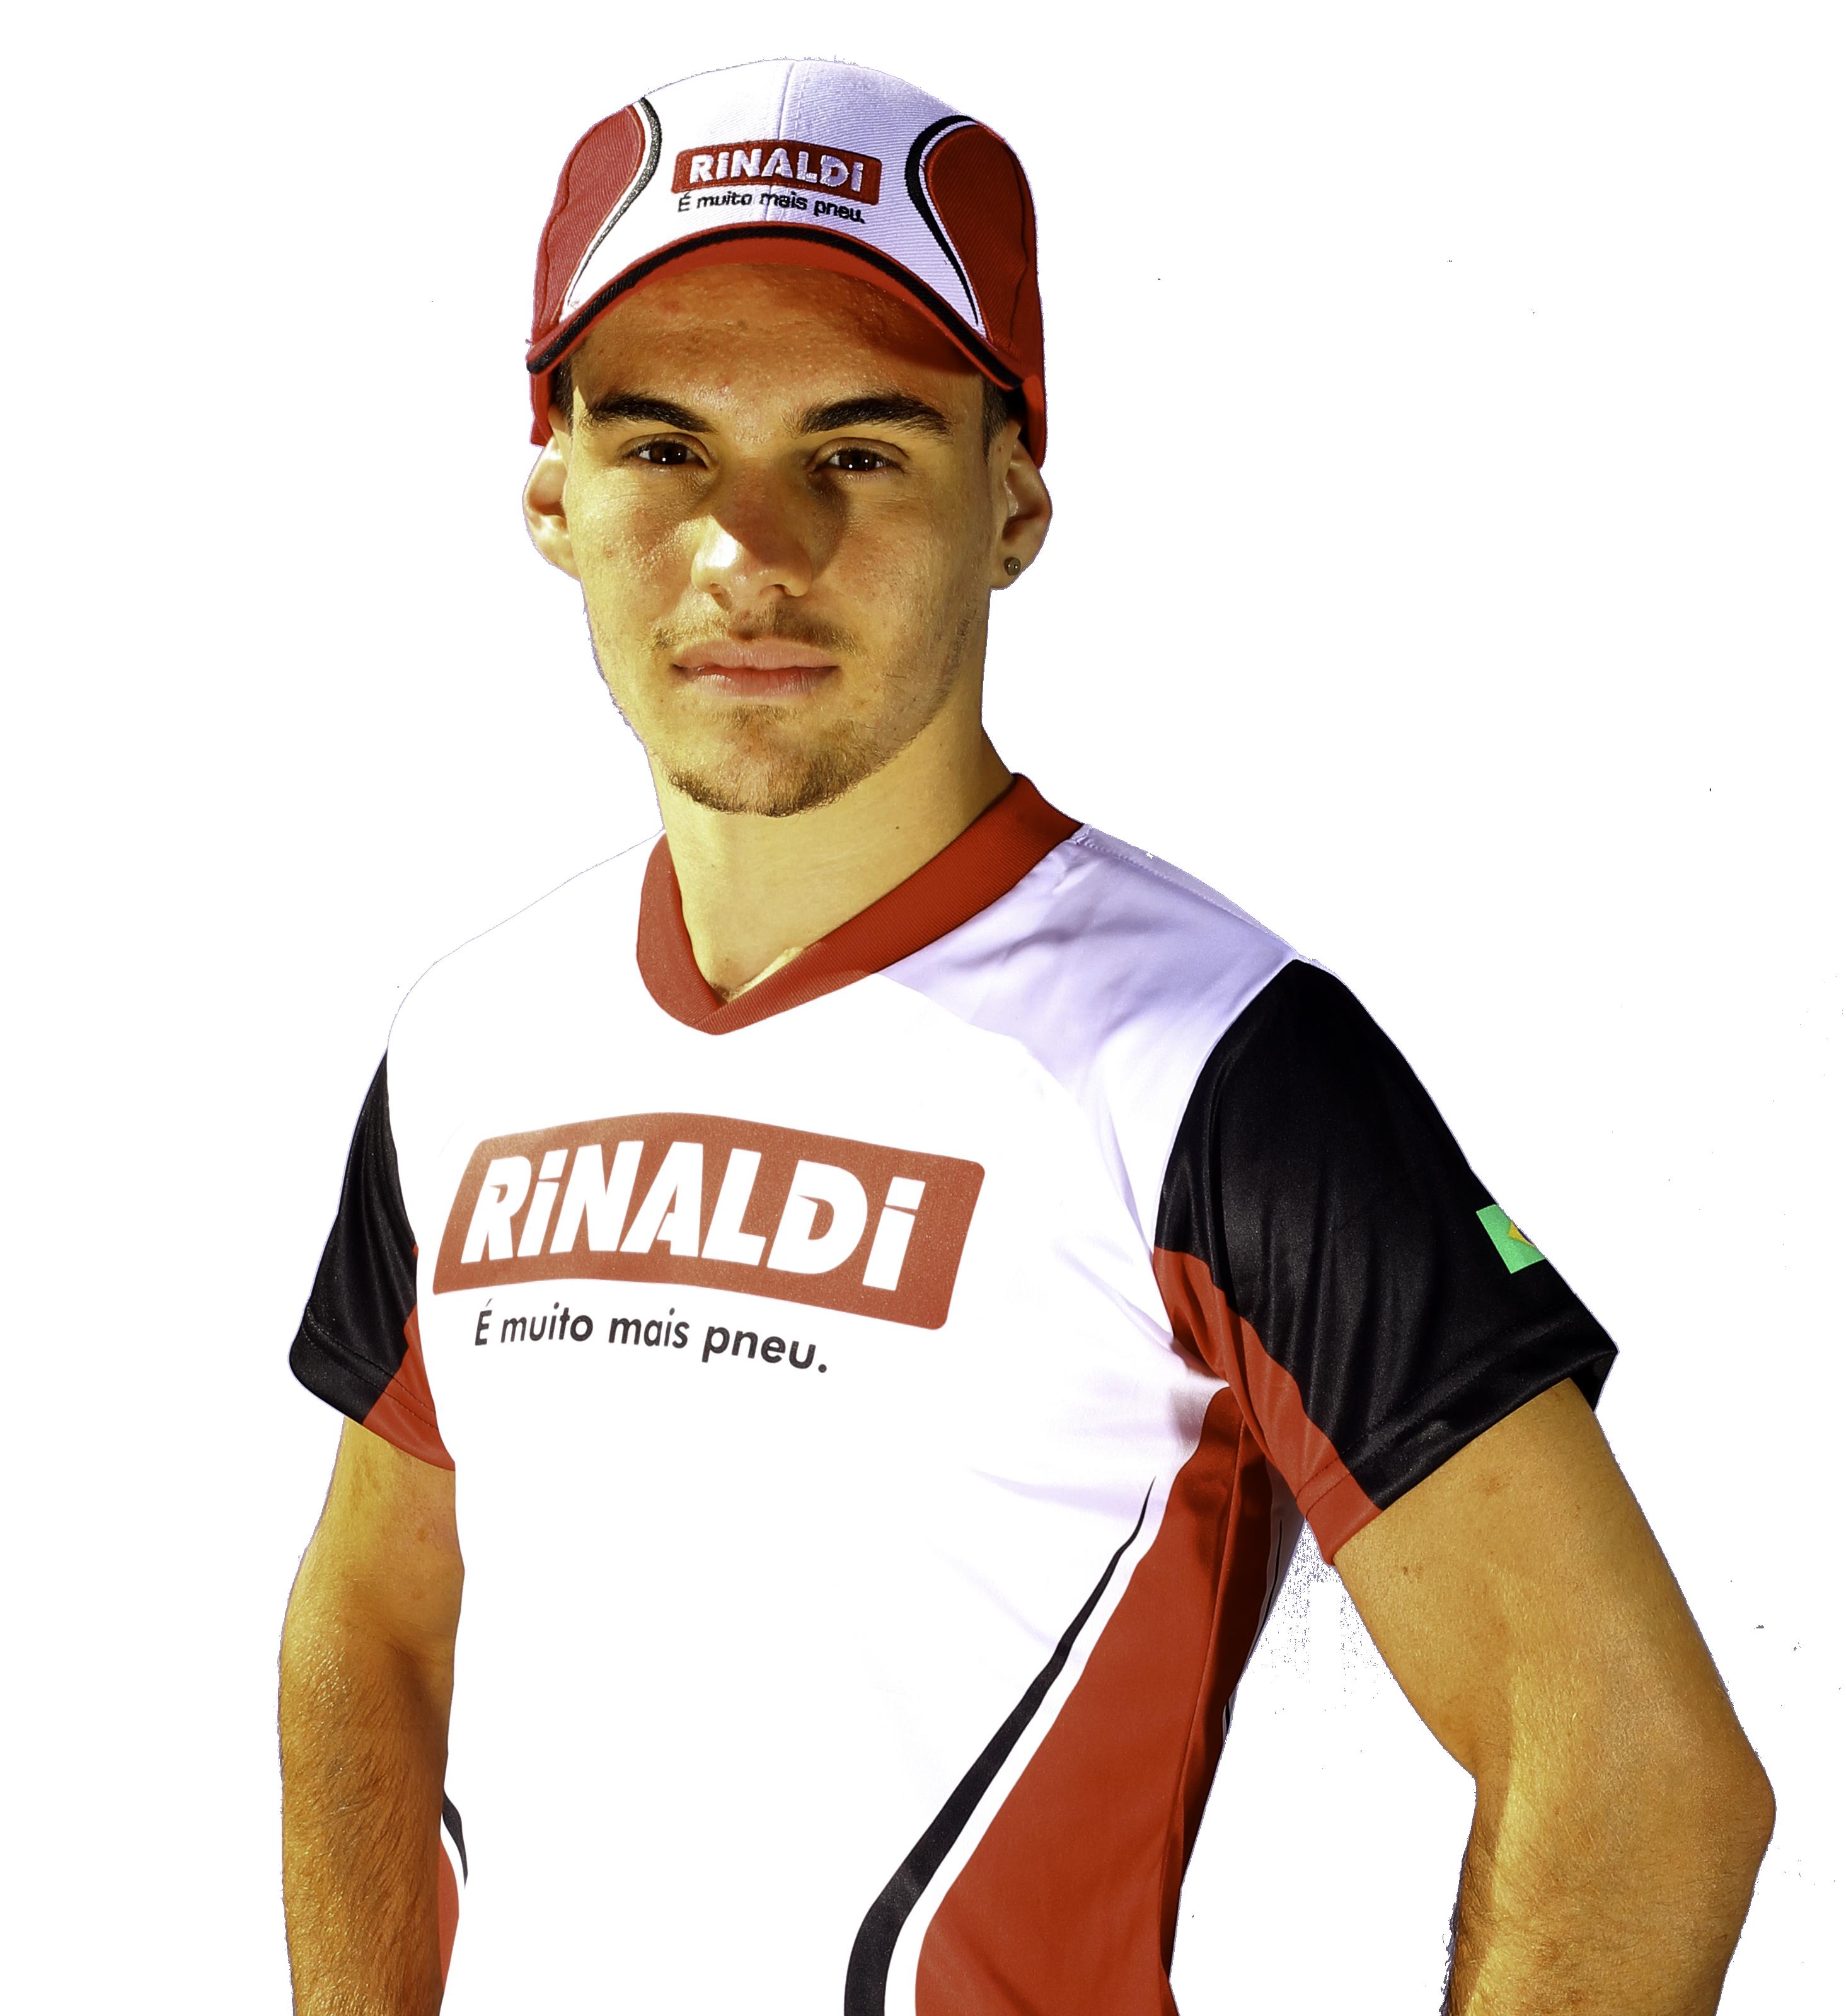 Frederico Spagnol